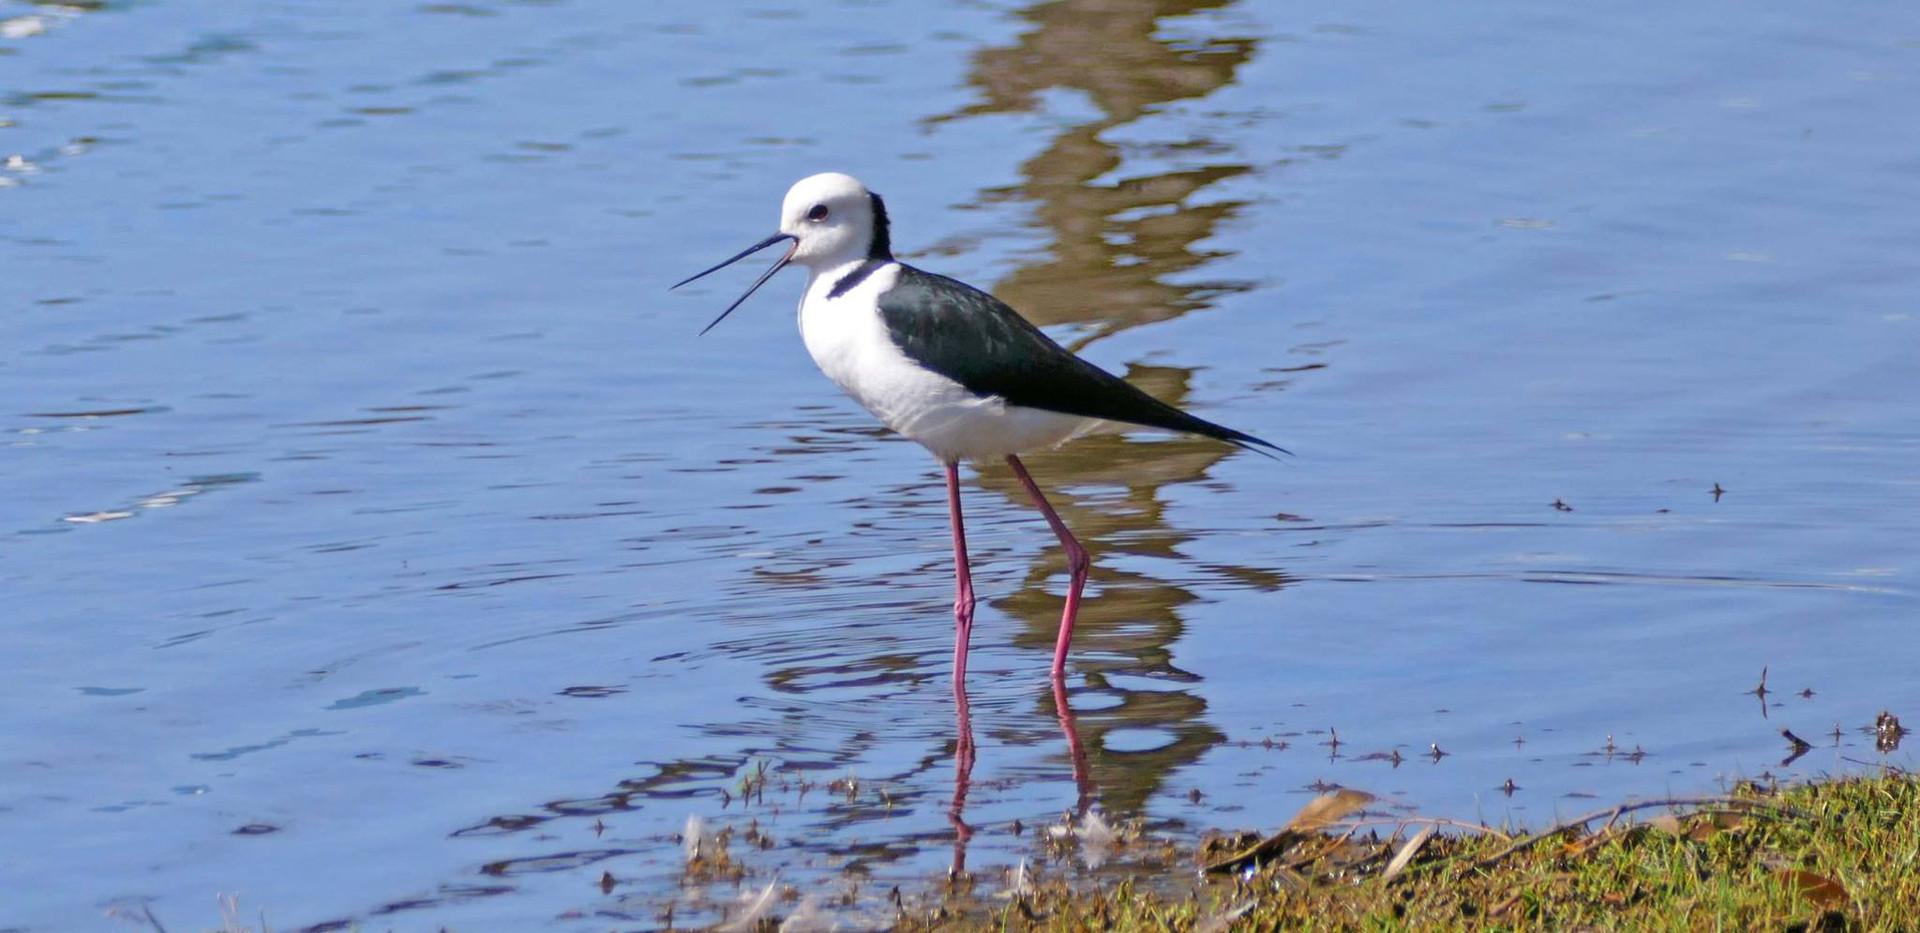 Black-winged or Pied Stilt